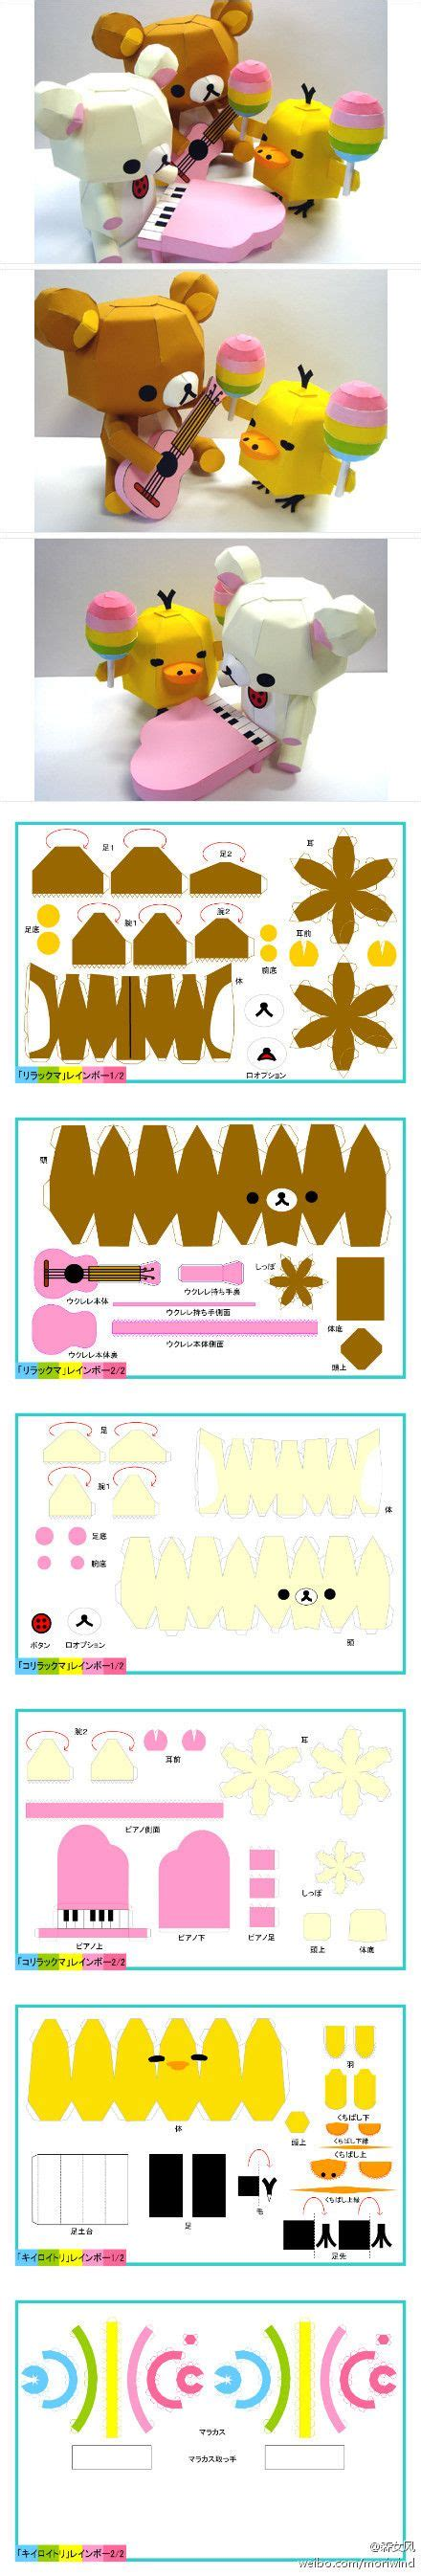 Rilakkuma Origami - 轻松熊 音乐组合 moldes caixas crafts kawaii and